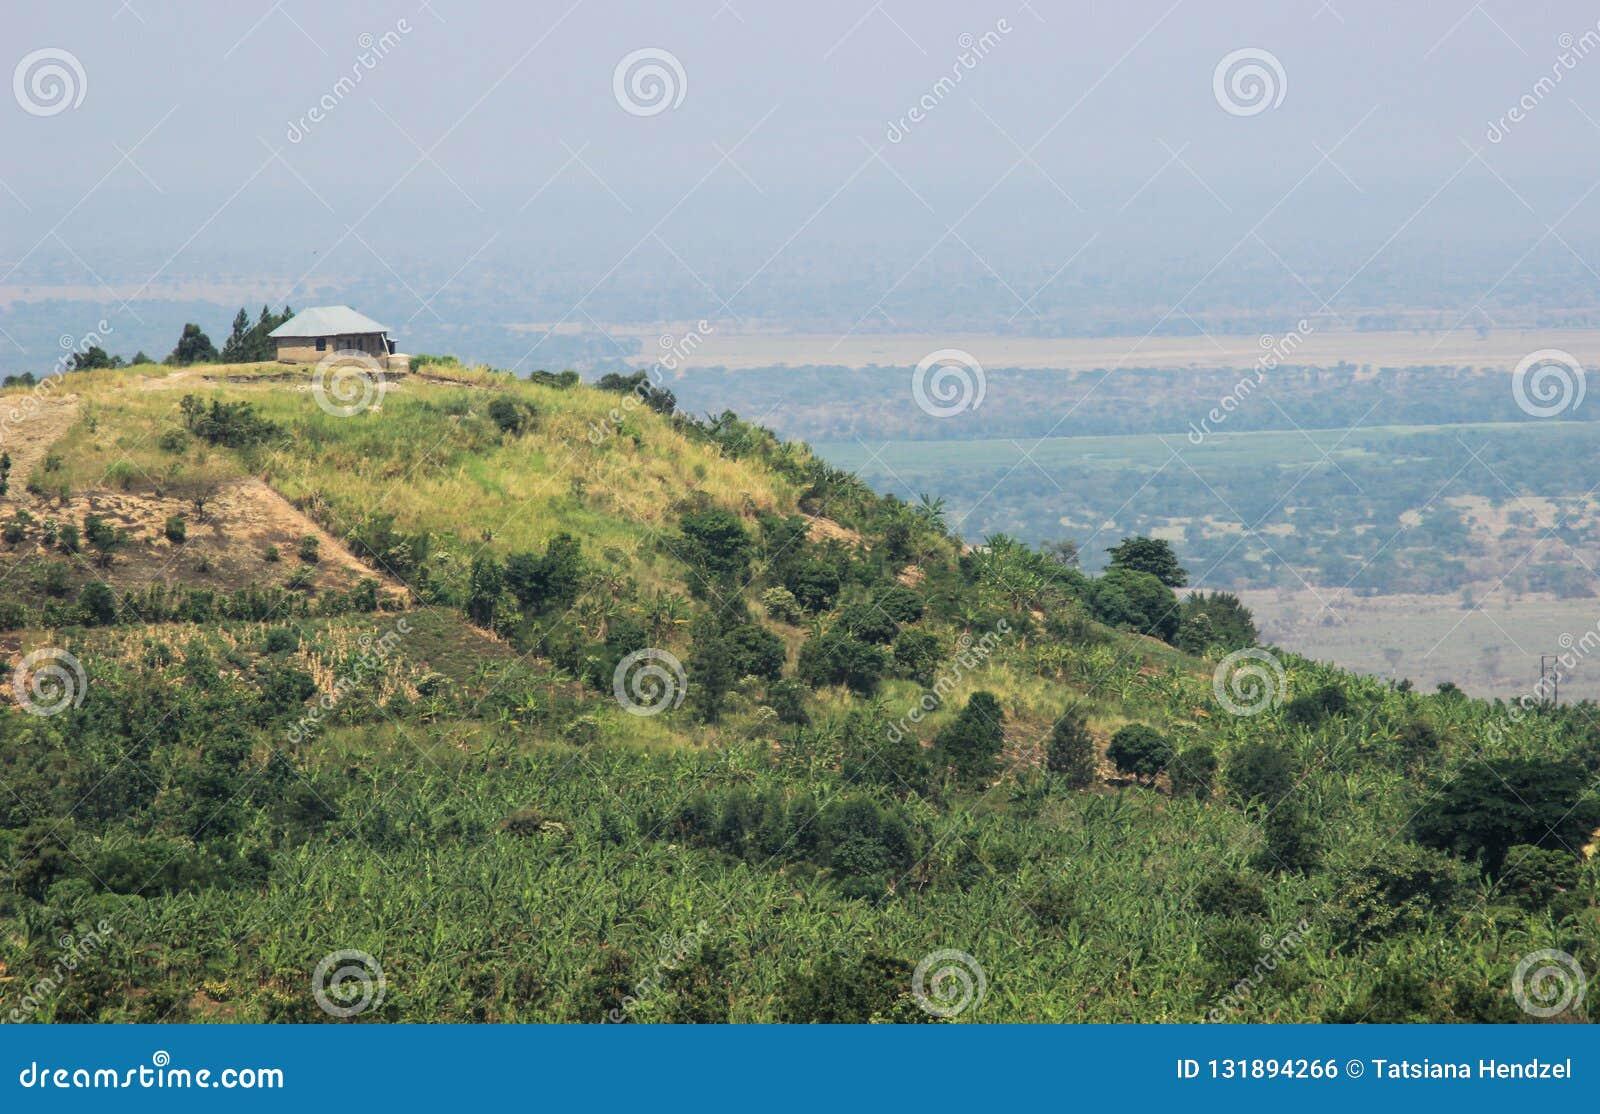 Great Rift Valley In Uganda Africa Landscare Stock Photo